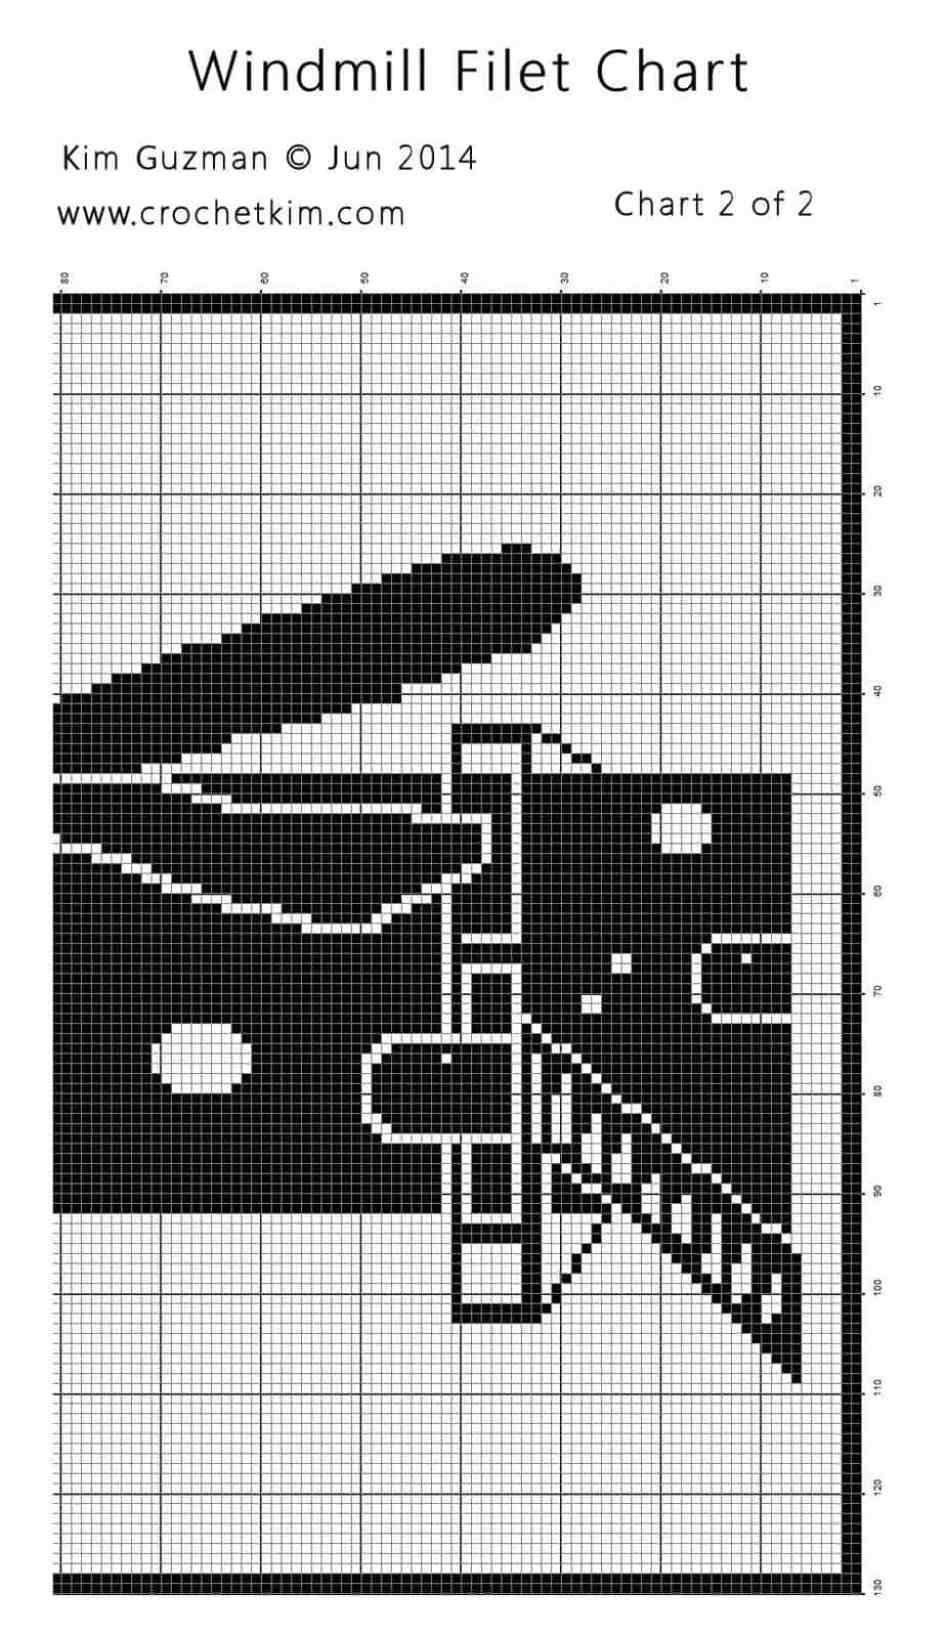 CrochetKim Free Crochet Pattern   Windmill Filet Chart @crochetkim